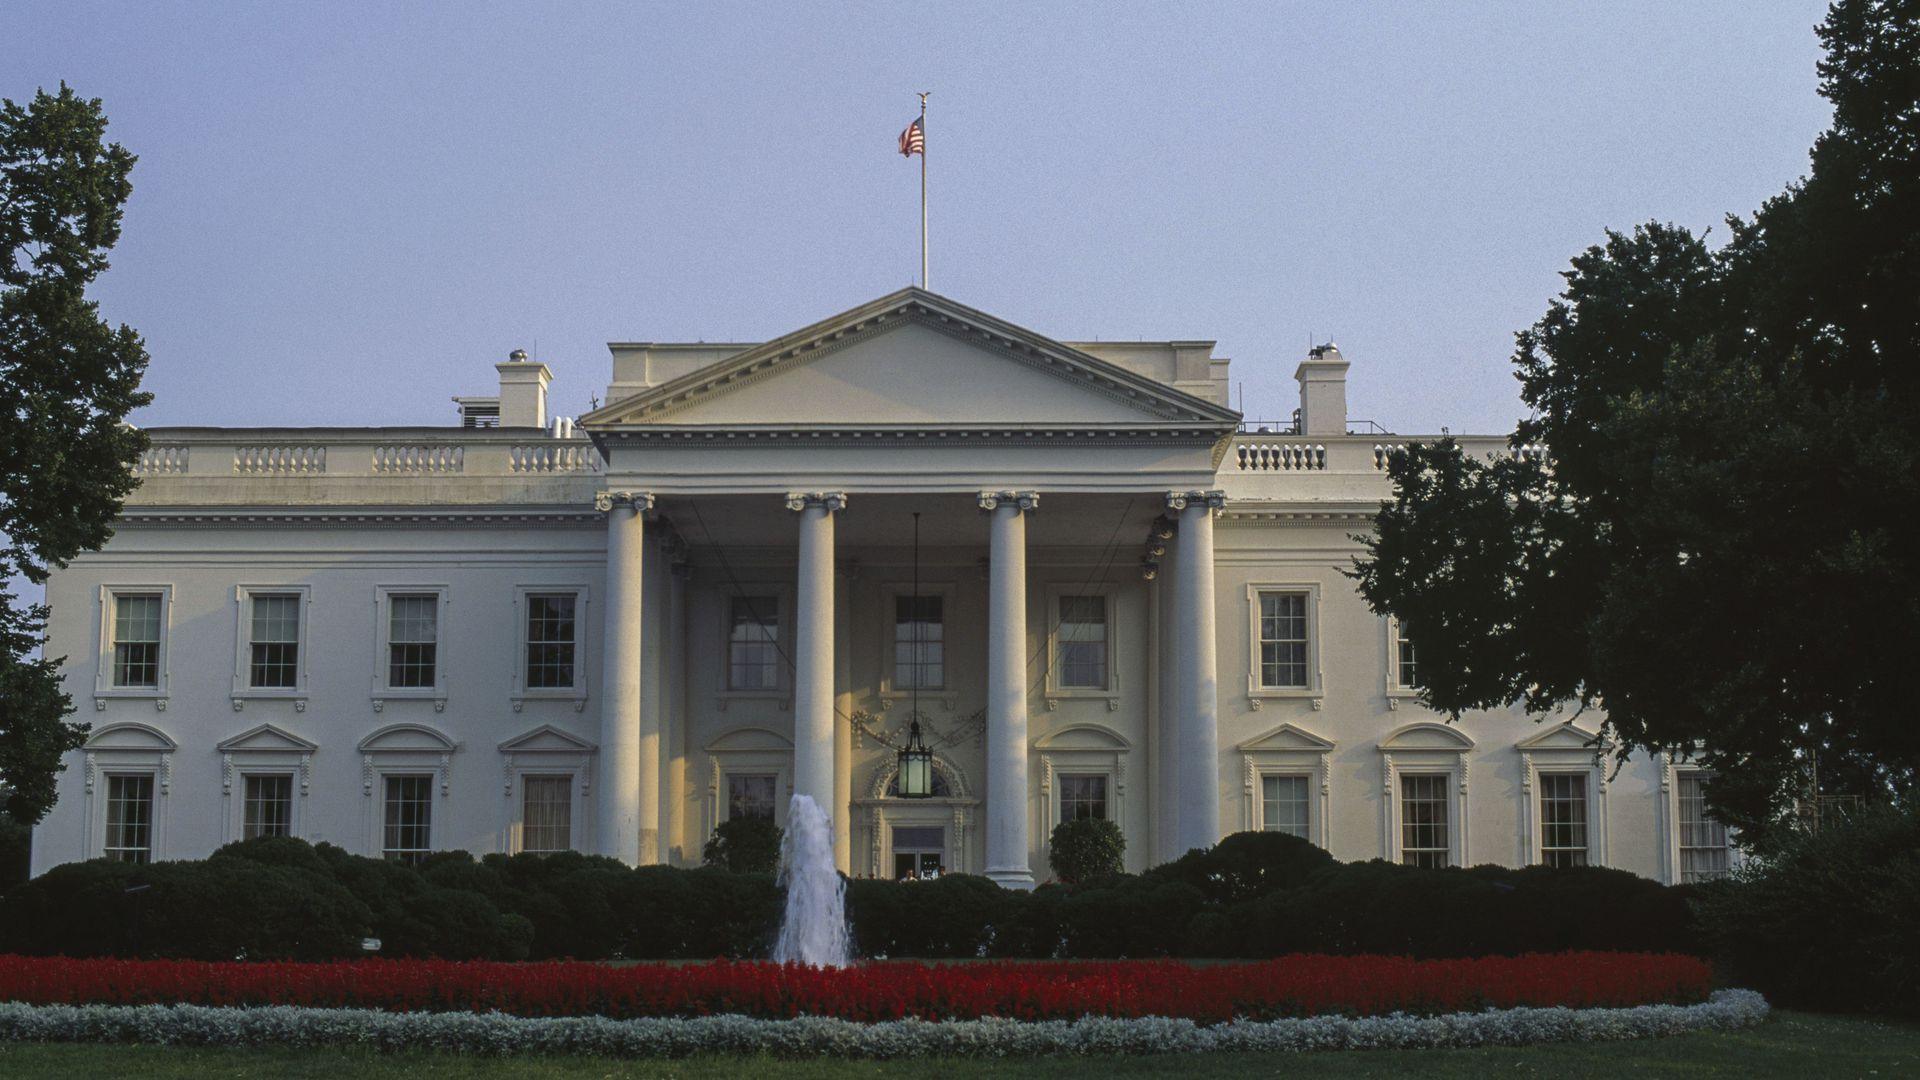 The fron tf the white house